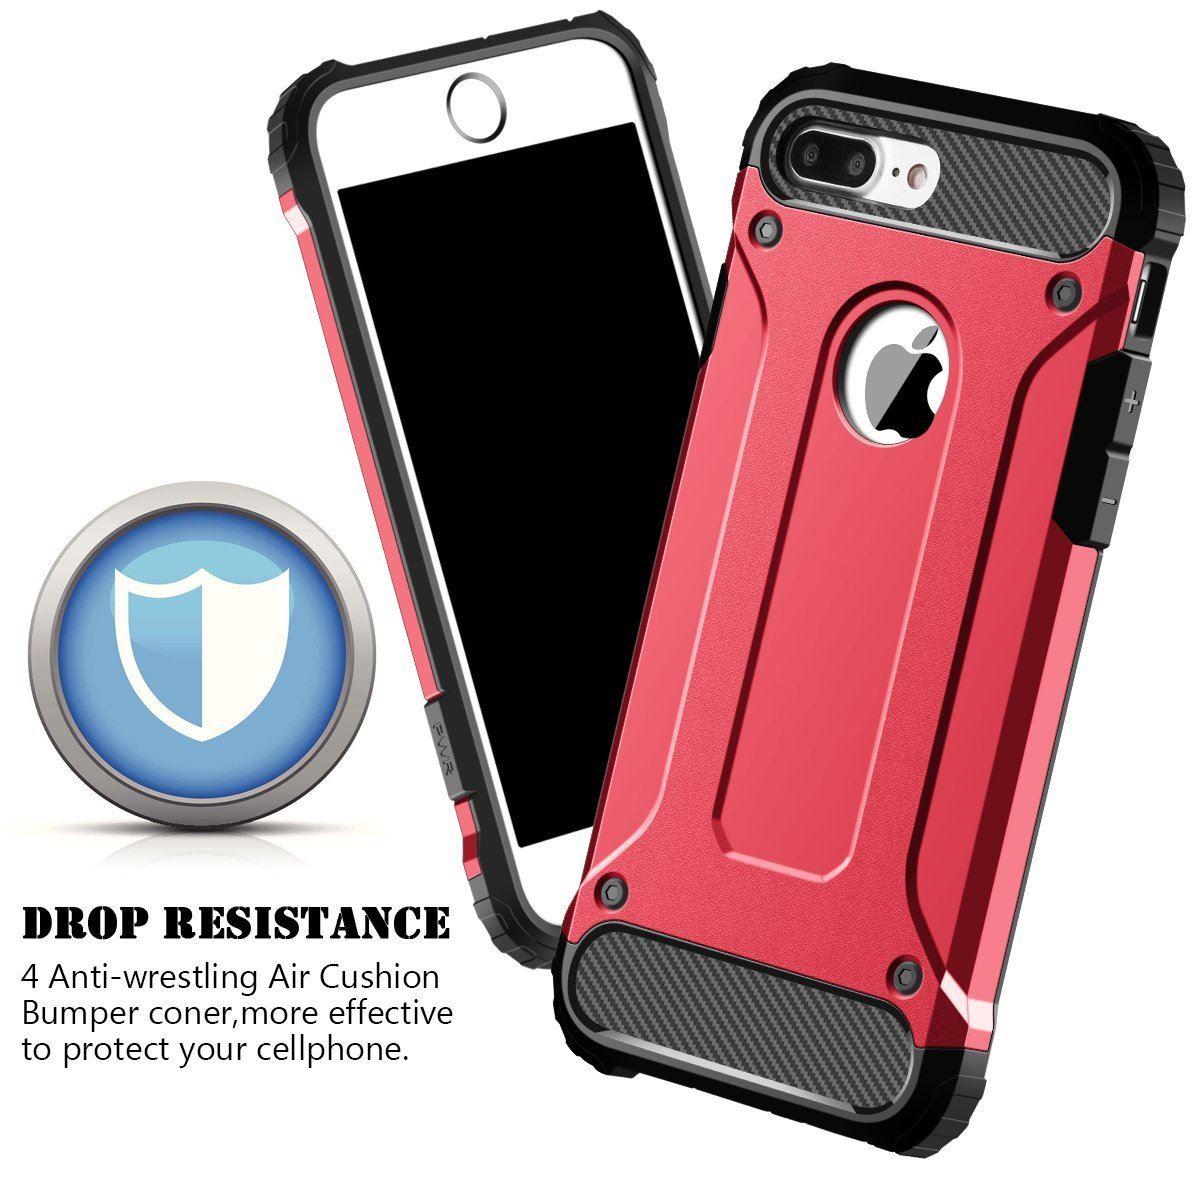 thumbnail 31 - For Apple iPhone 11 Pro Max XR Xs X 8 7 Plus 6 5 Se Case Cover Impact Heavy Duty